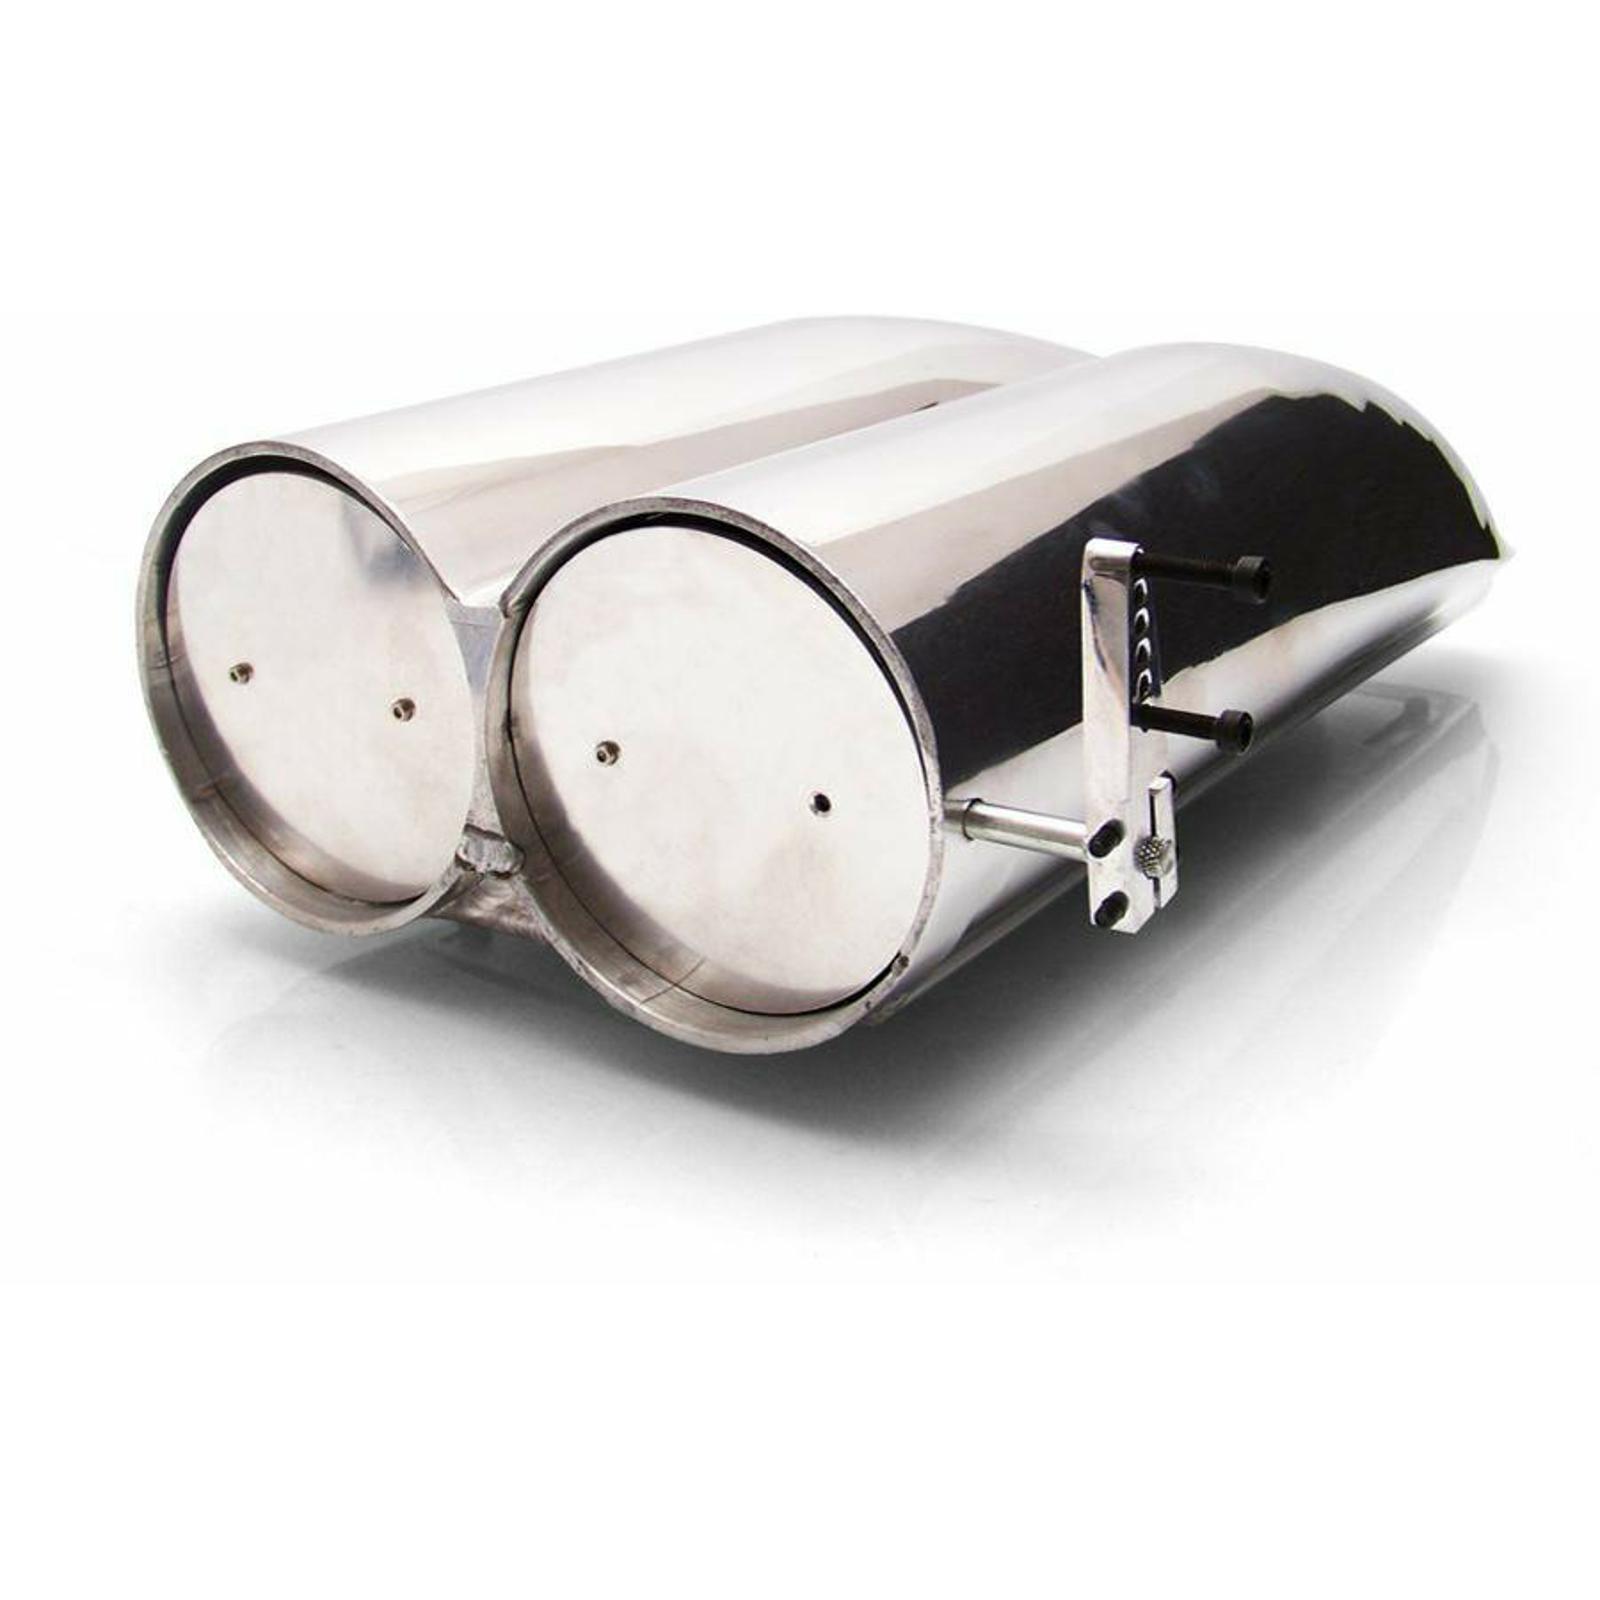 Shotgun Air Intake For Chevy Big Small Block Motor